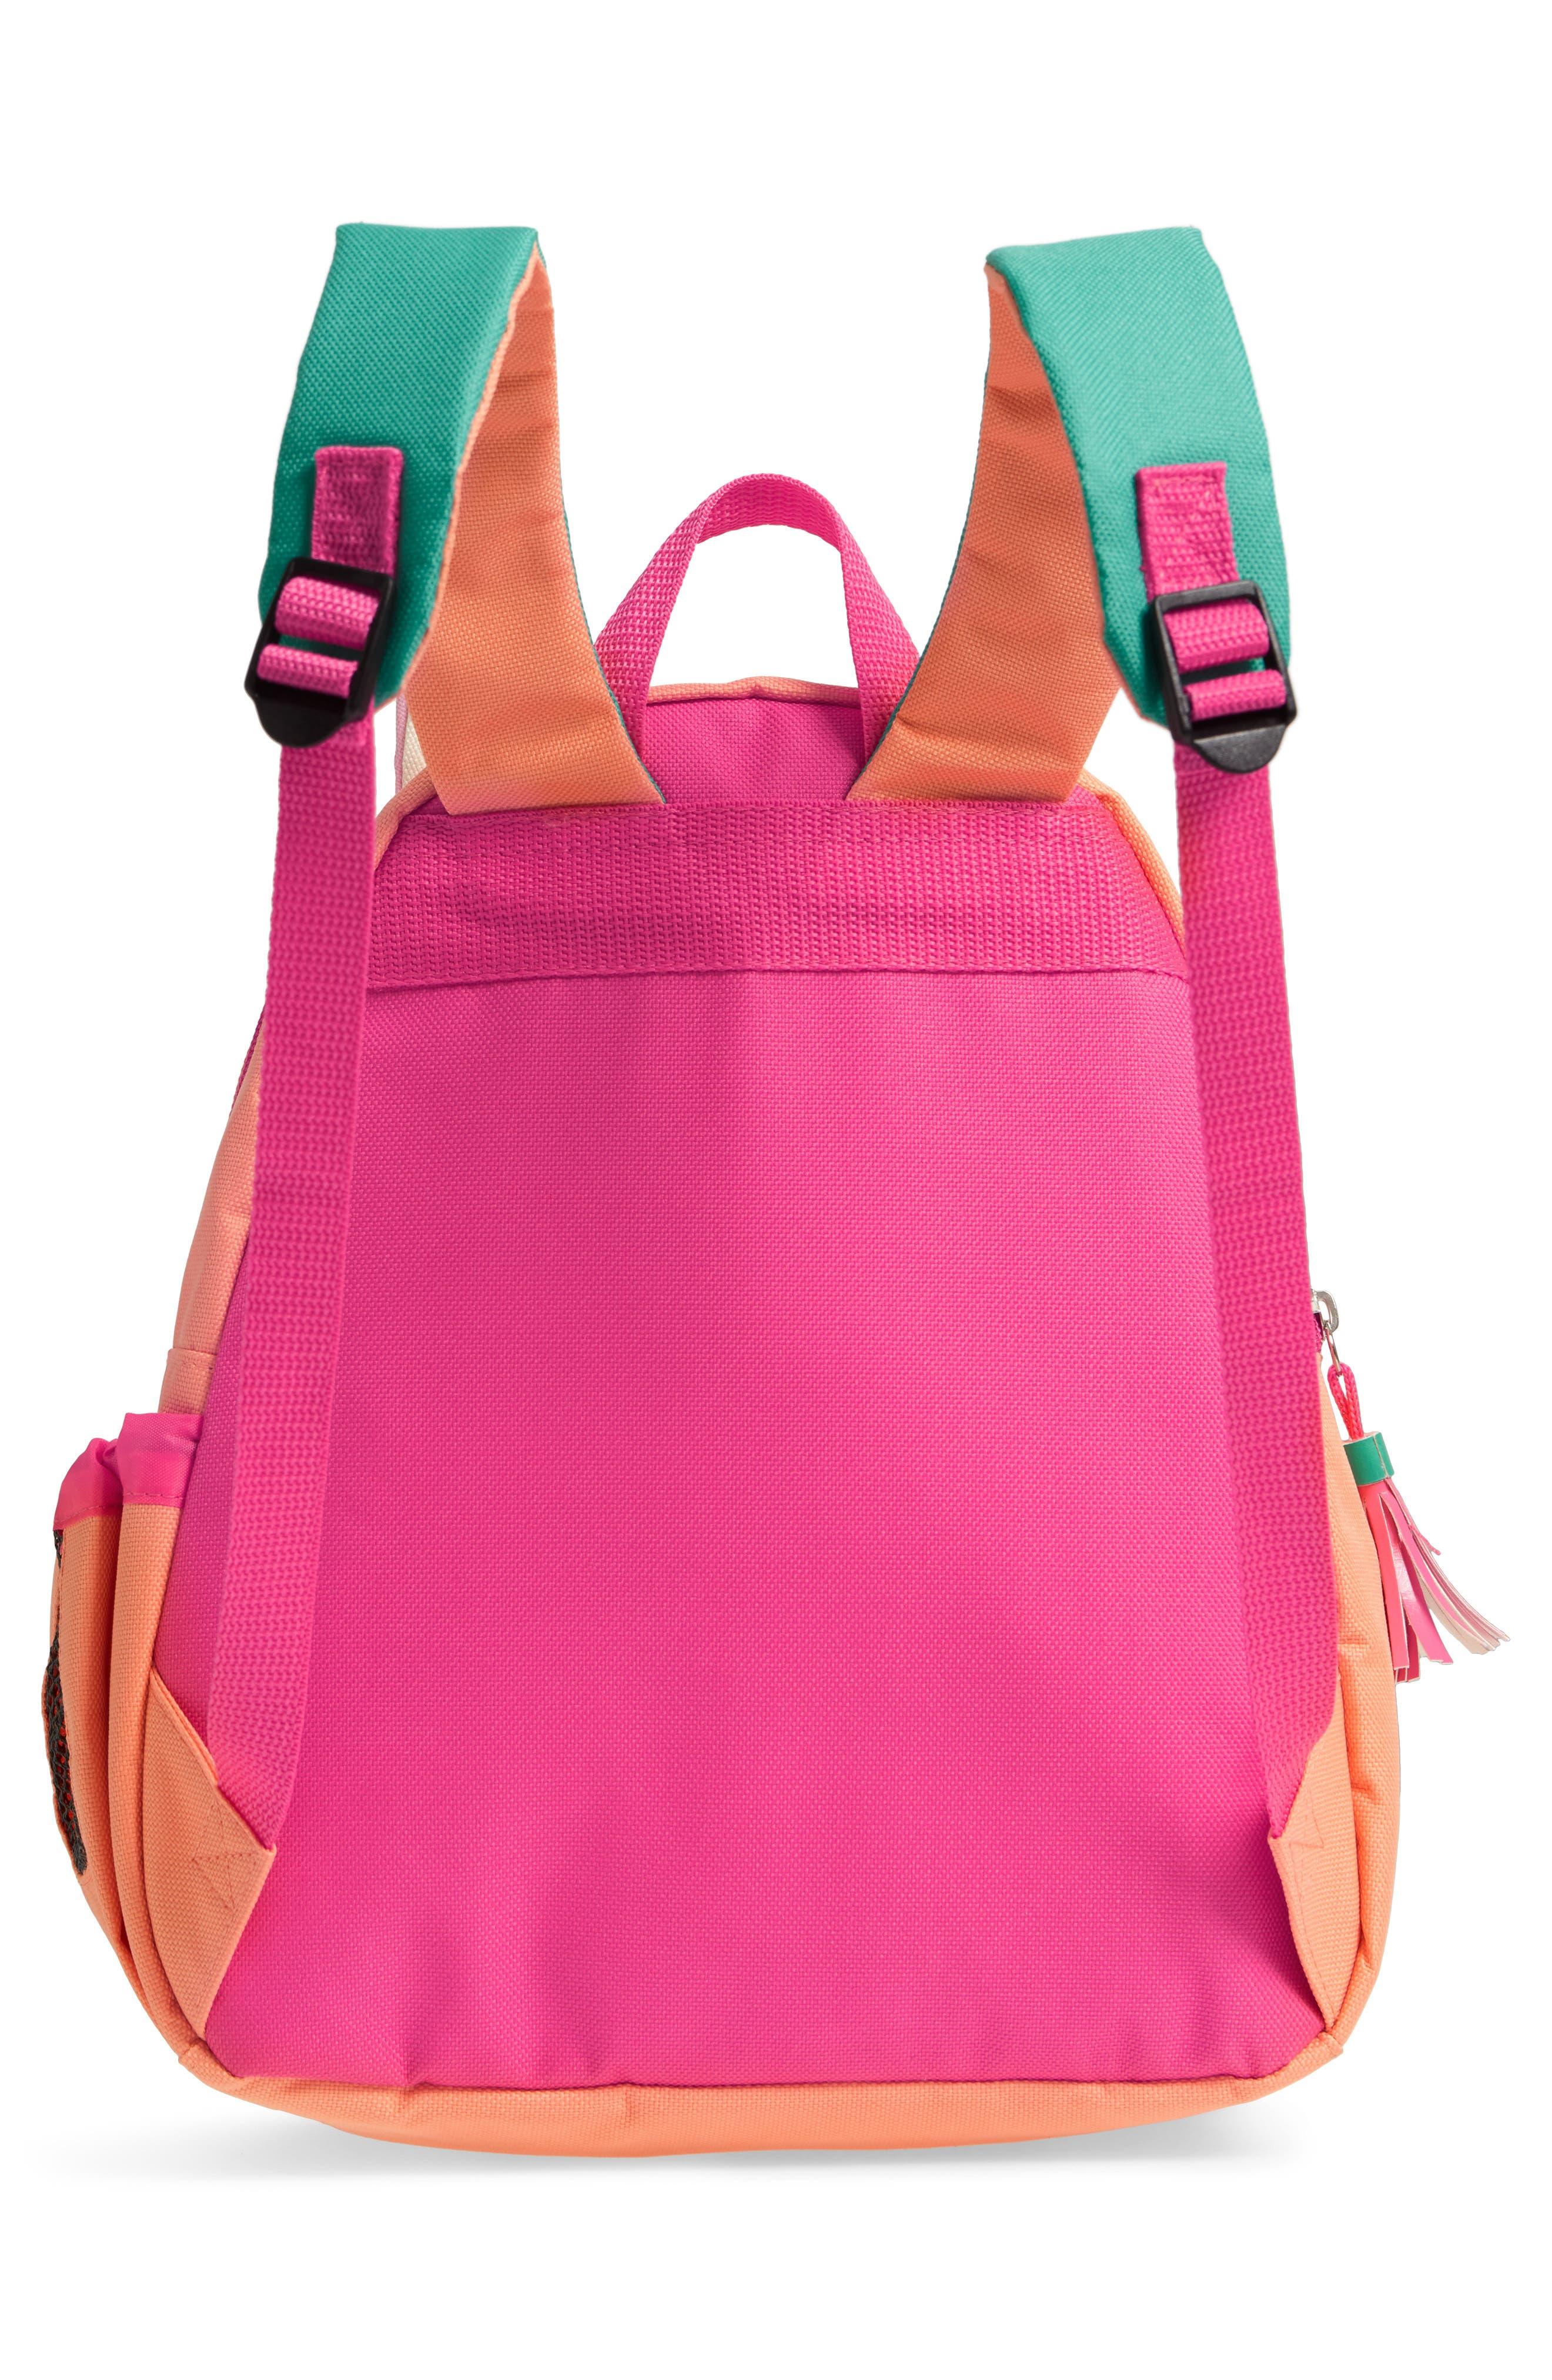 SKIP HOP, Zoo Pack Llama Backpack, Alternate thumbnail 2, color, PINK MULTI